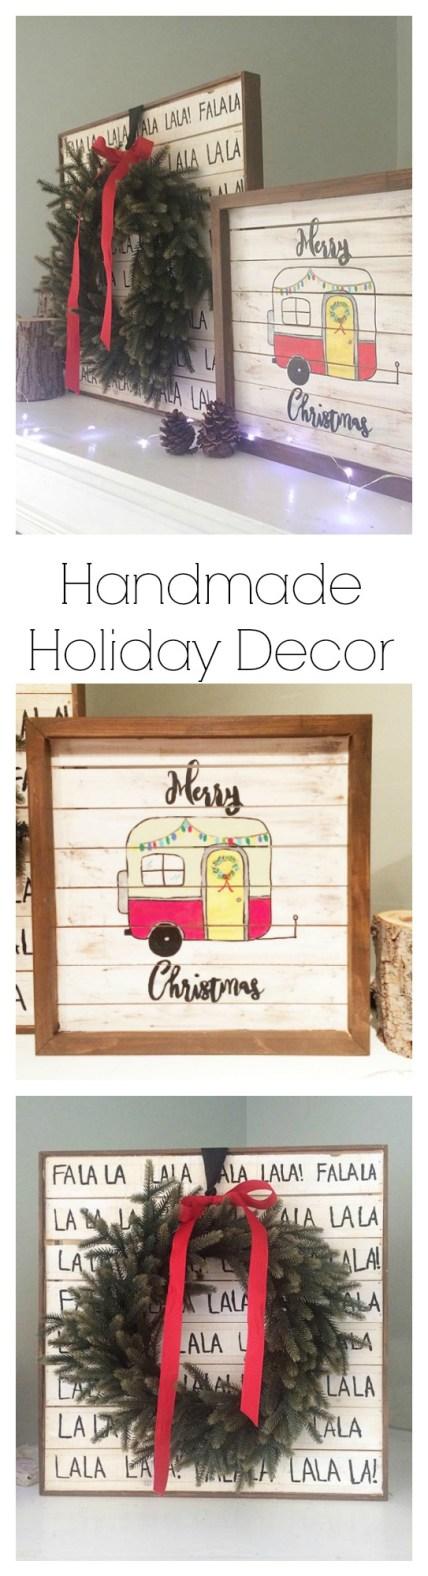 handmade-holiday-decor